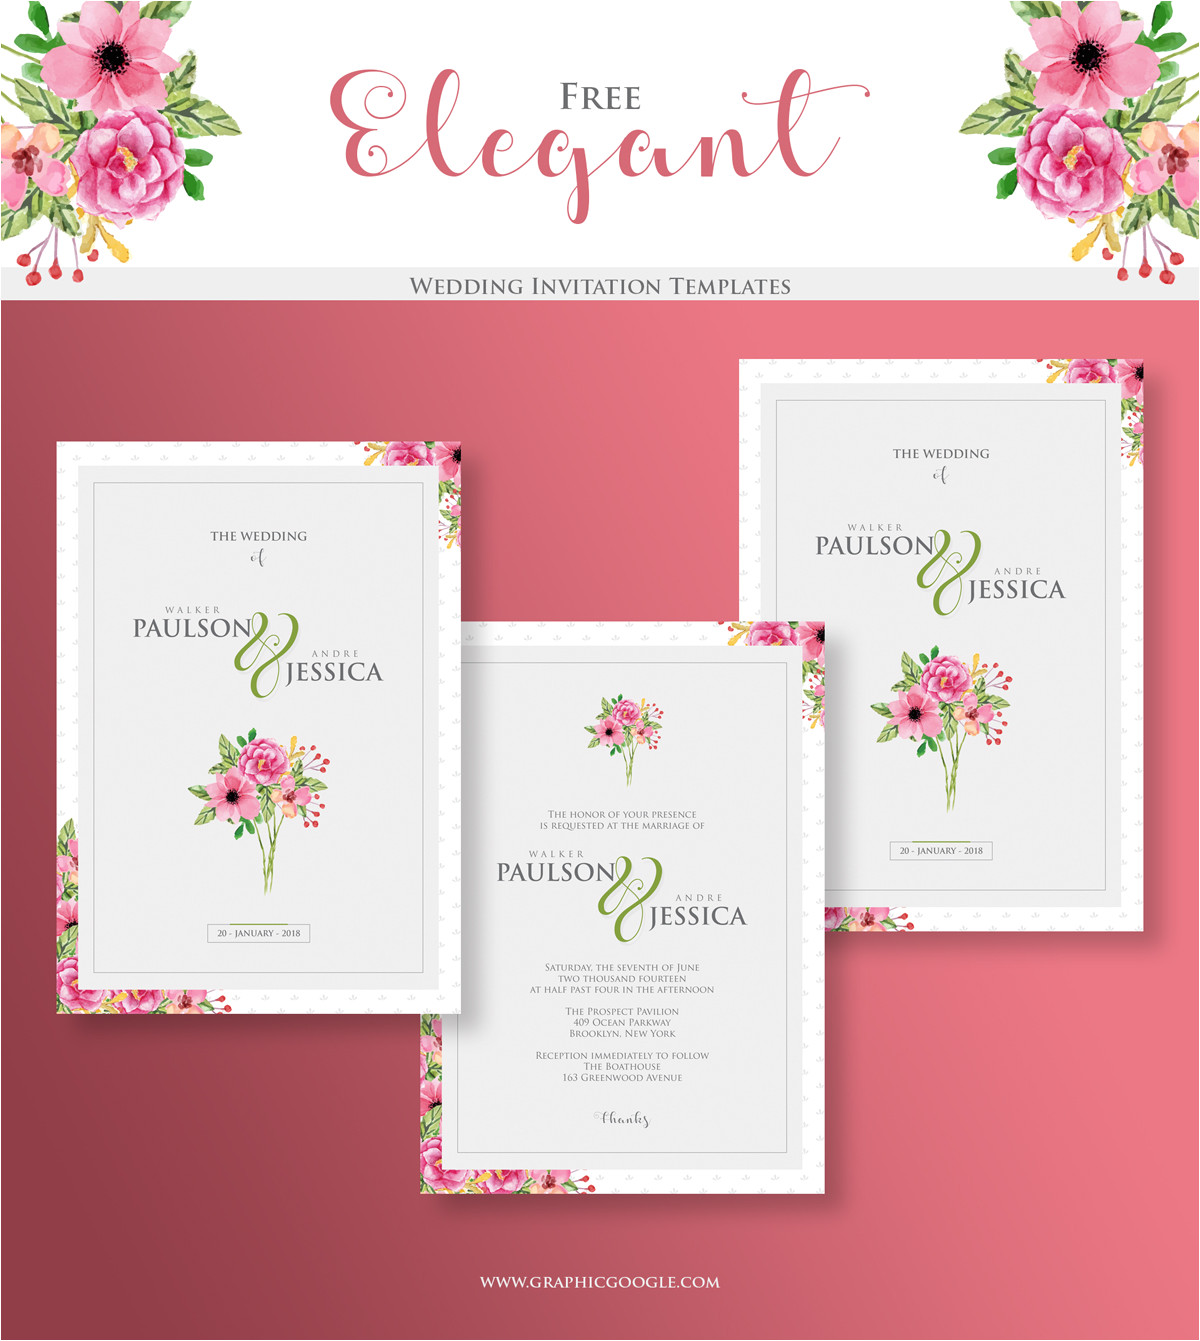 free elegant wedding invitation templates